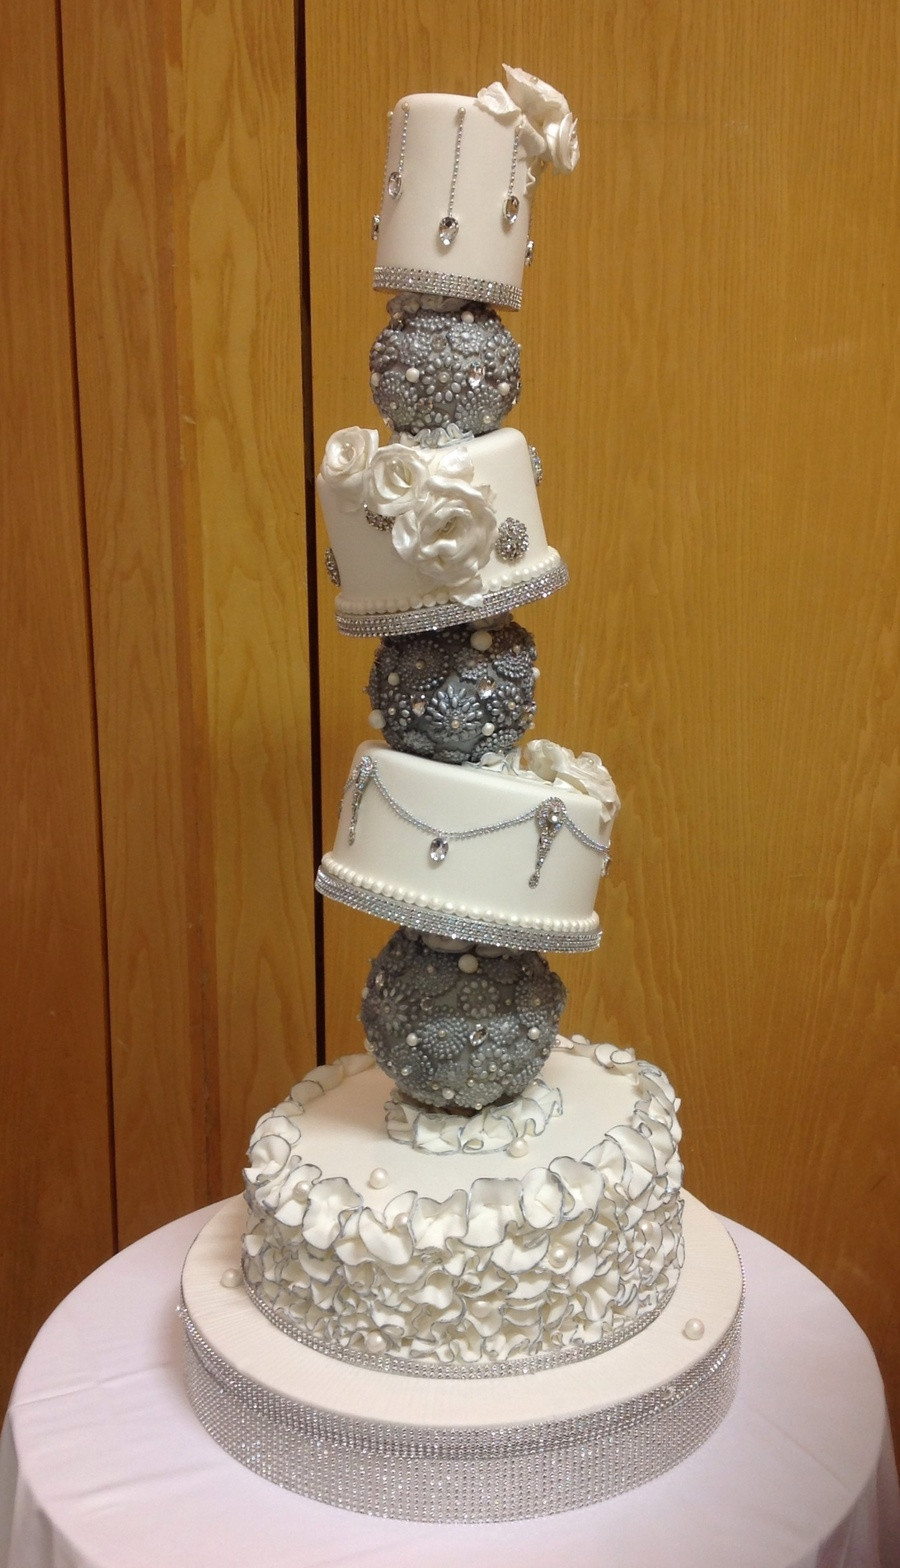 Topsy Turvey Wedding Cakes  Topsy Turvy Wedding Cake CakeCentral